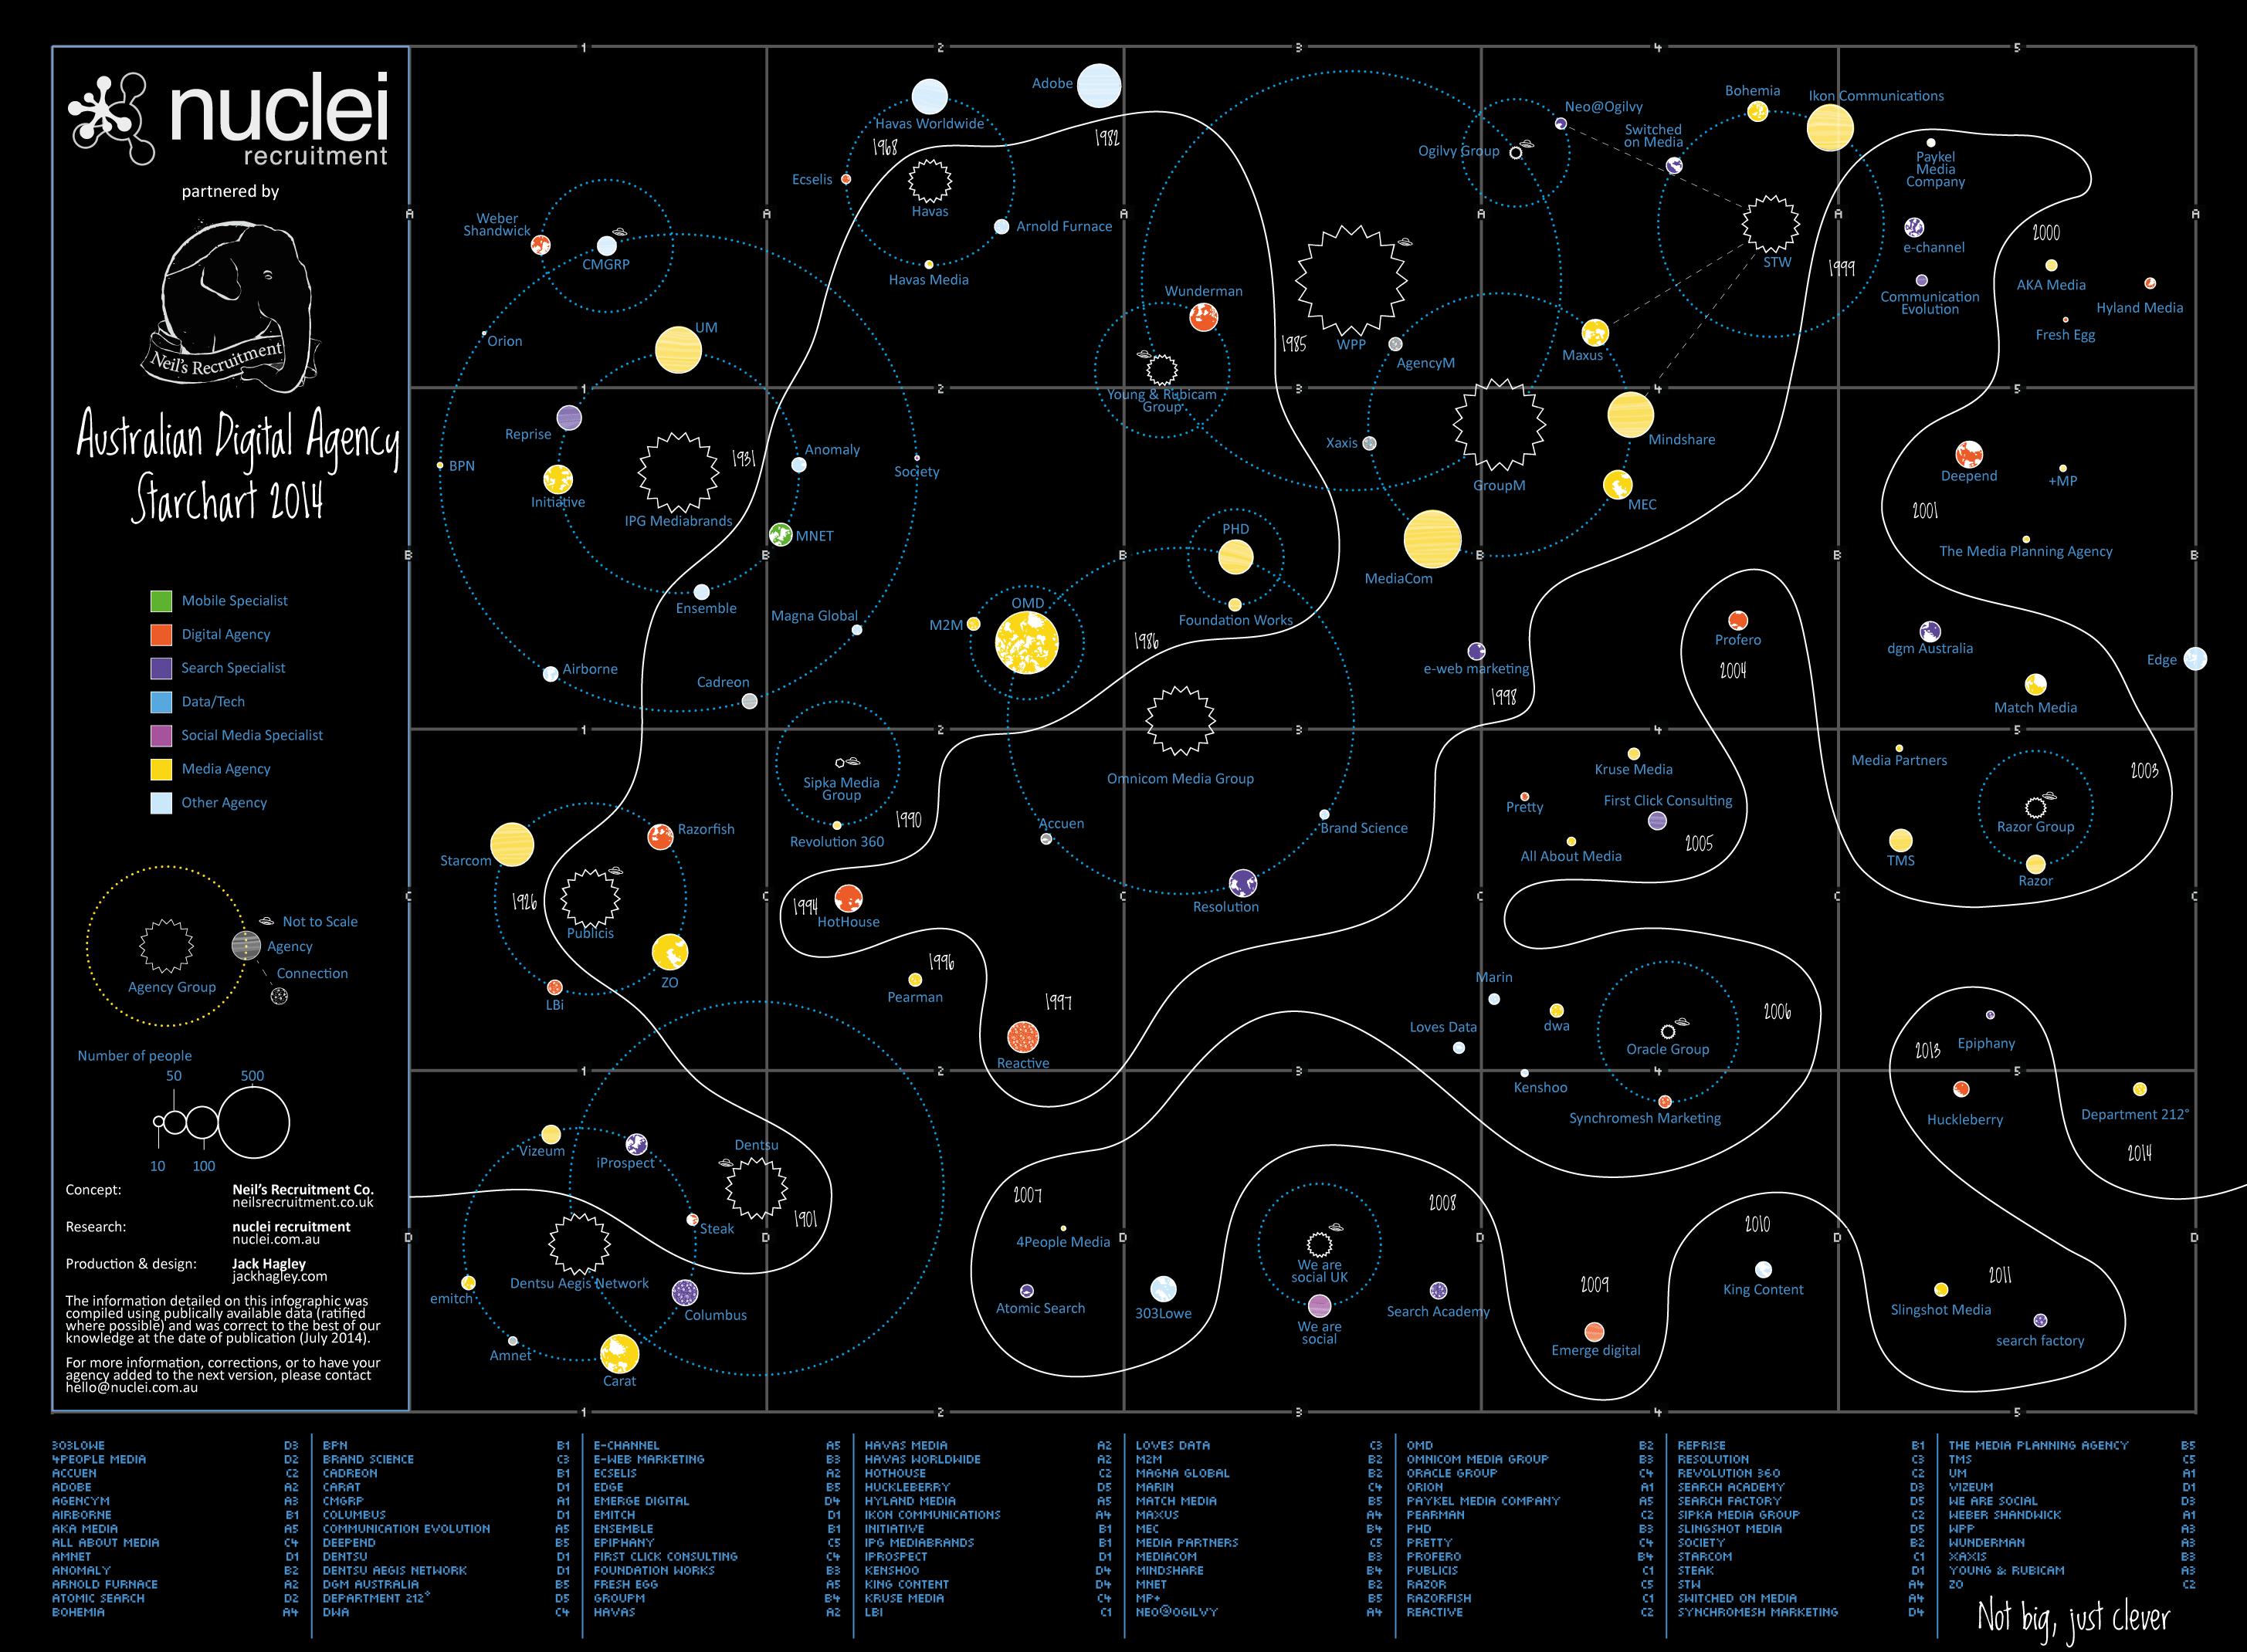 australian-agency-star-chart-2014